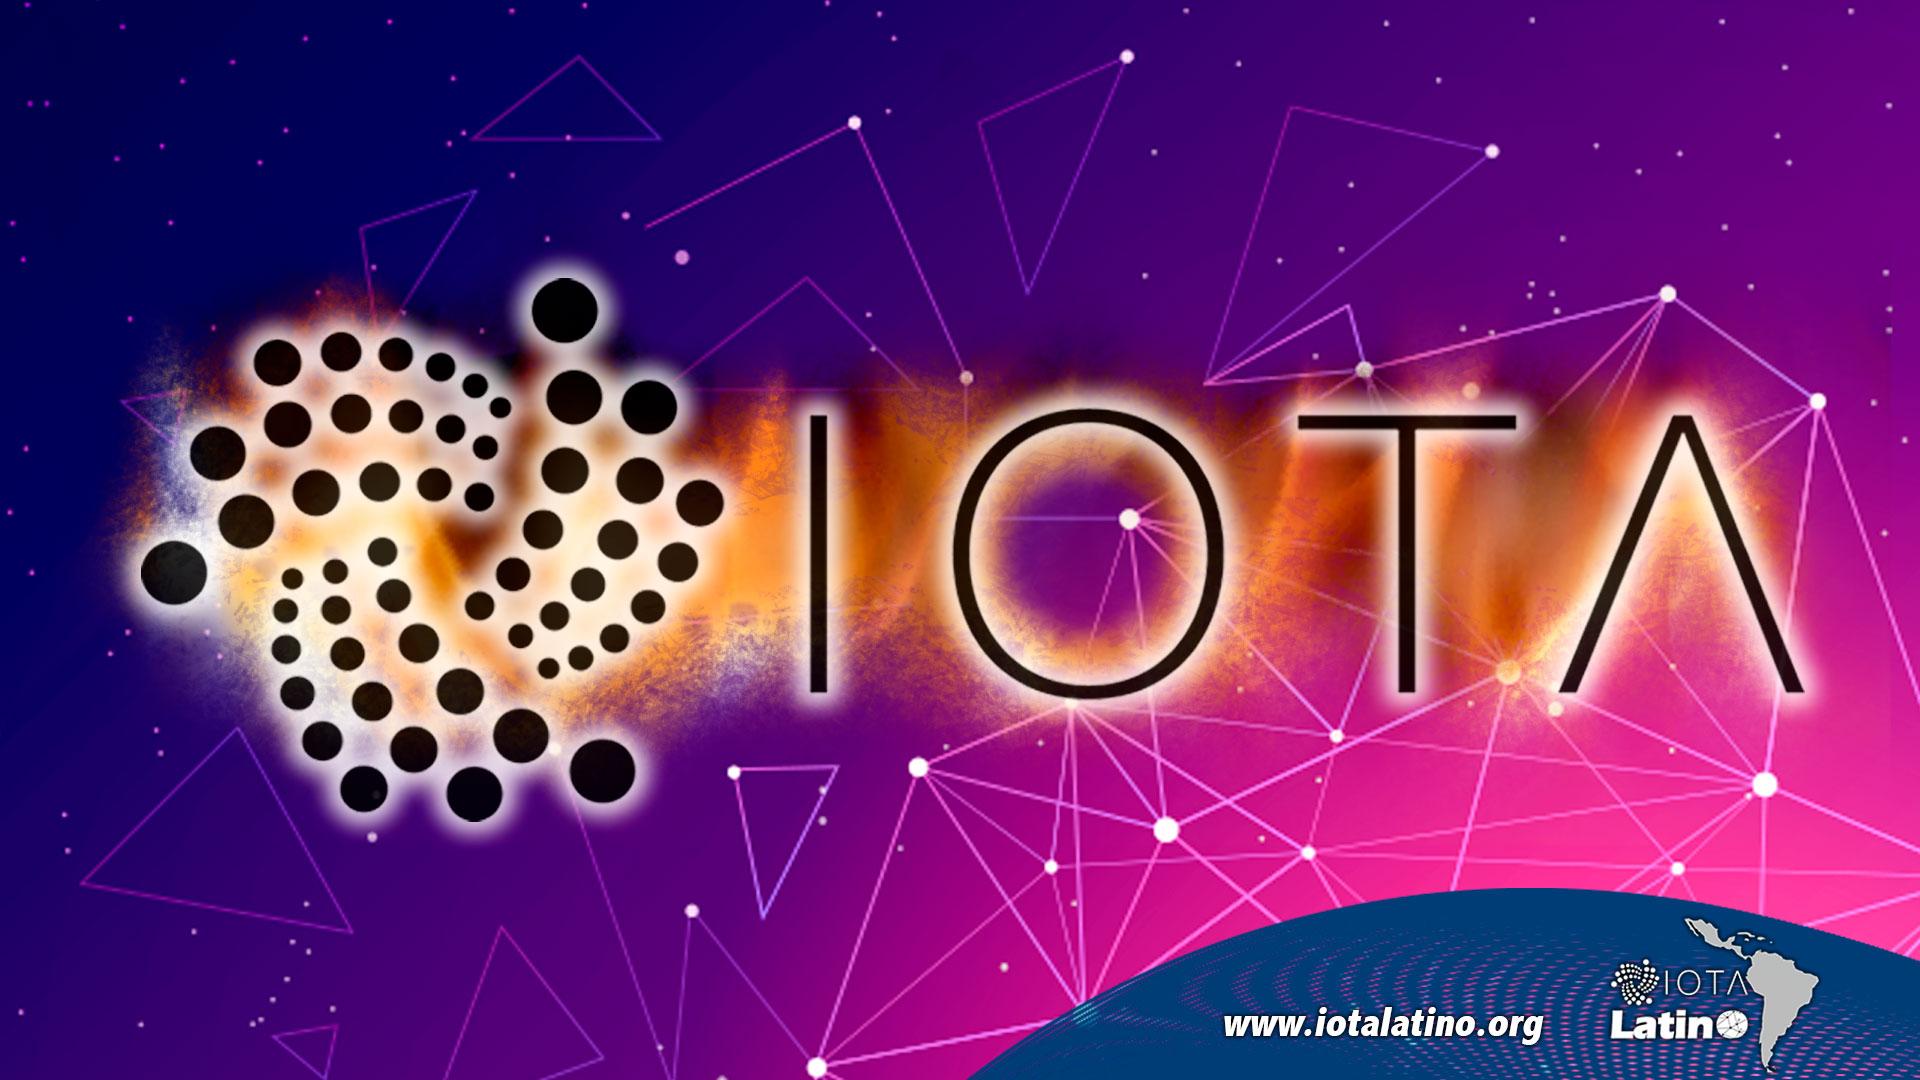 MIOTA - tecnología - IOTA